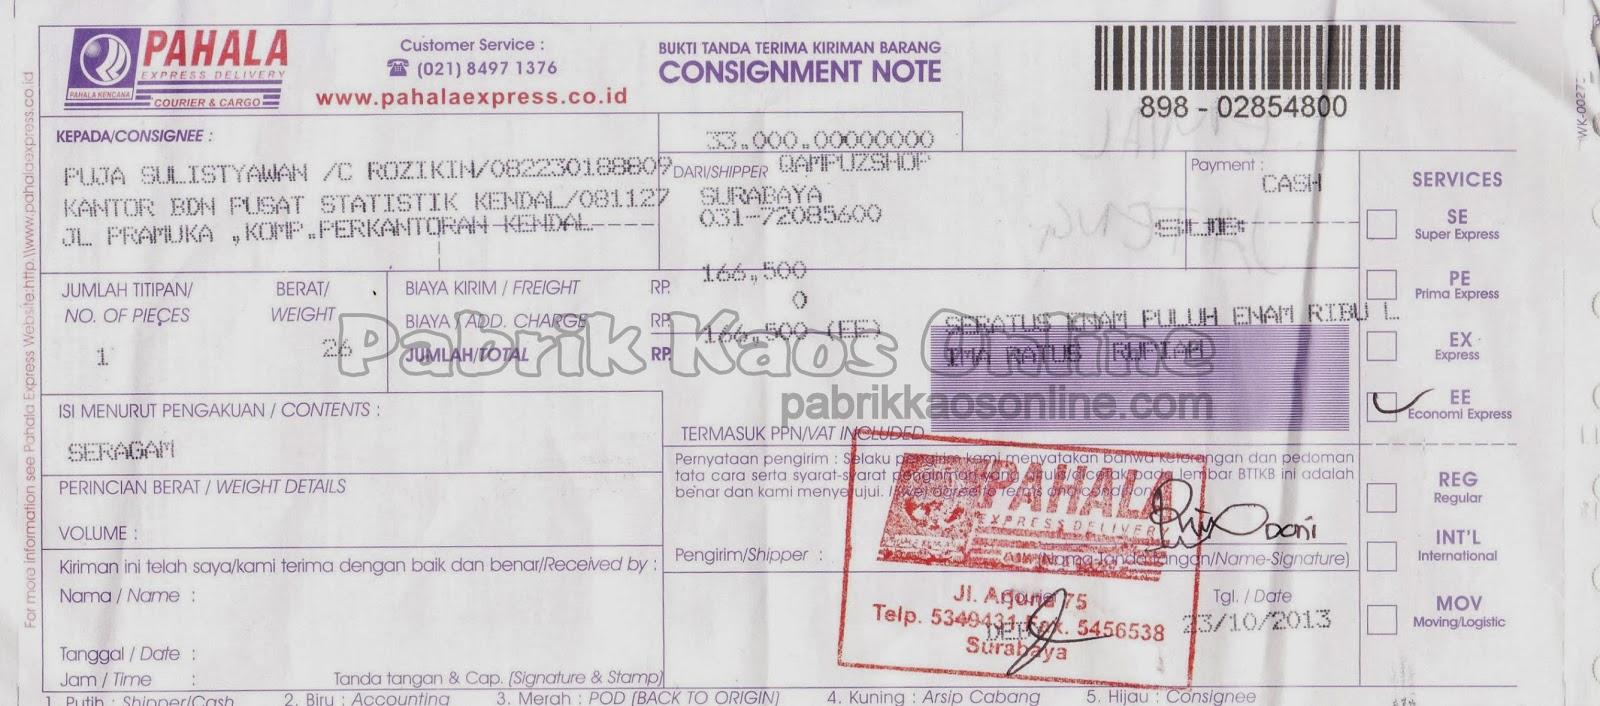 nota kirim kendal via pahala express delivery